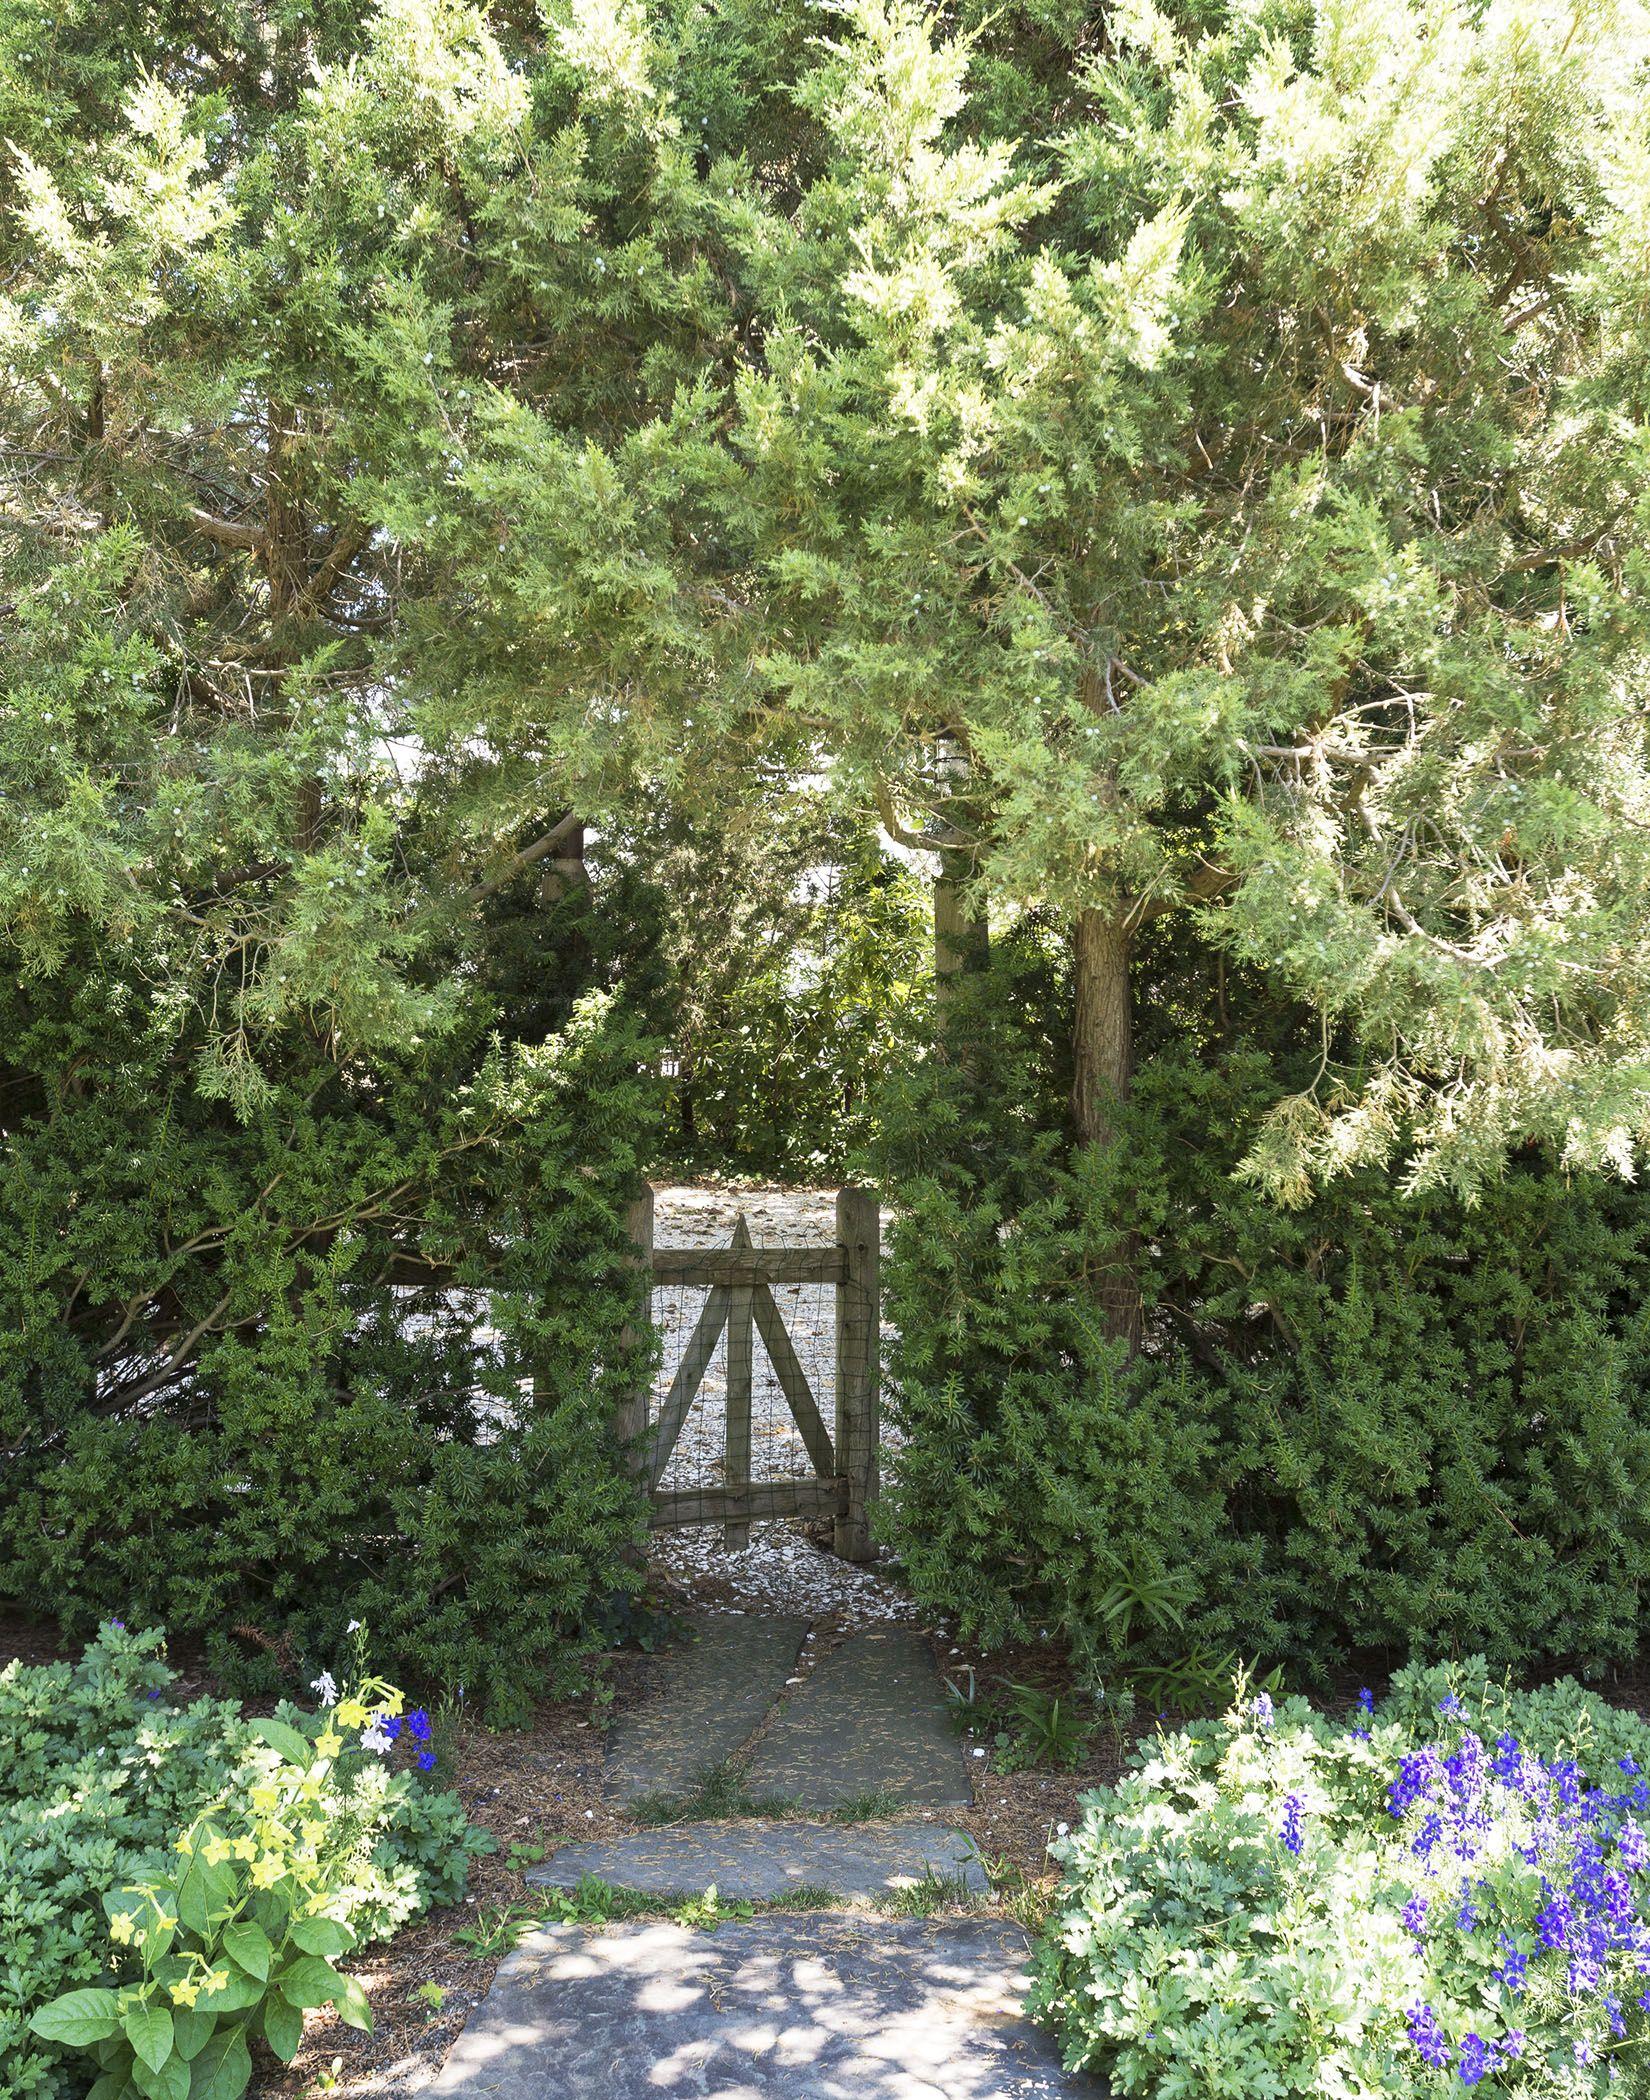 4f1acf2bt3y21wna54fhfu7x.wpengine.netdna-cdn.com wp-content uploads 2016 10 machado-silvetti-cape-cod-studio-garden-matthew-williams-DSC-7409.jpg